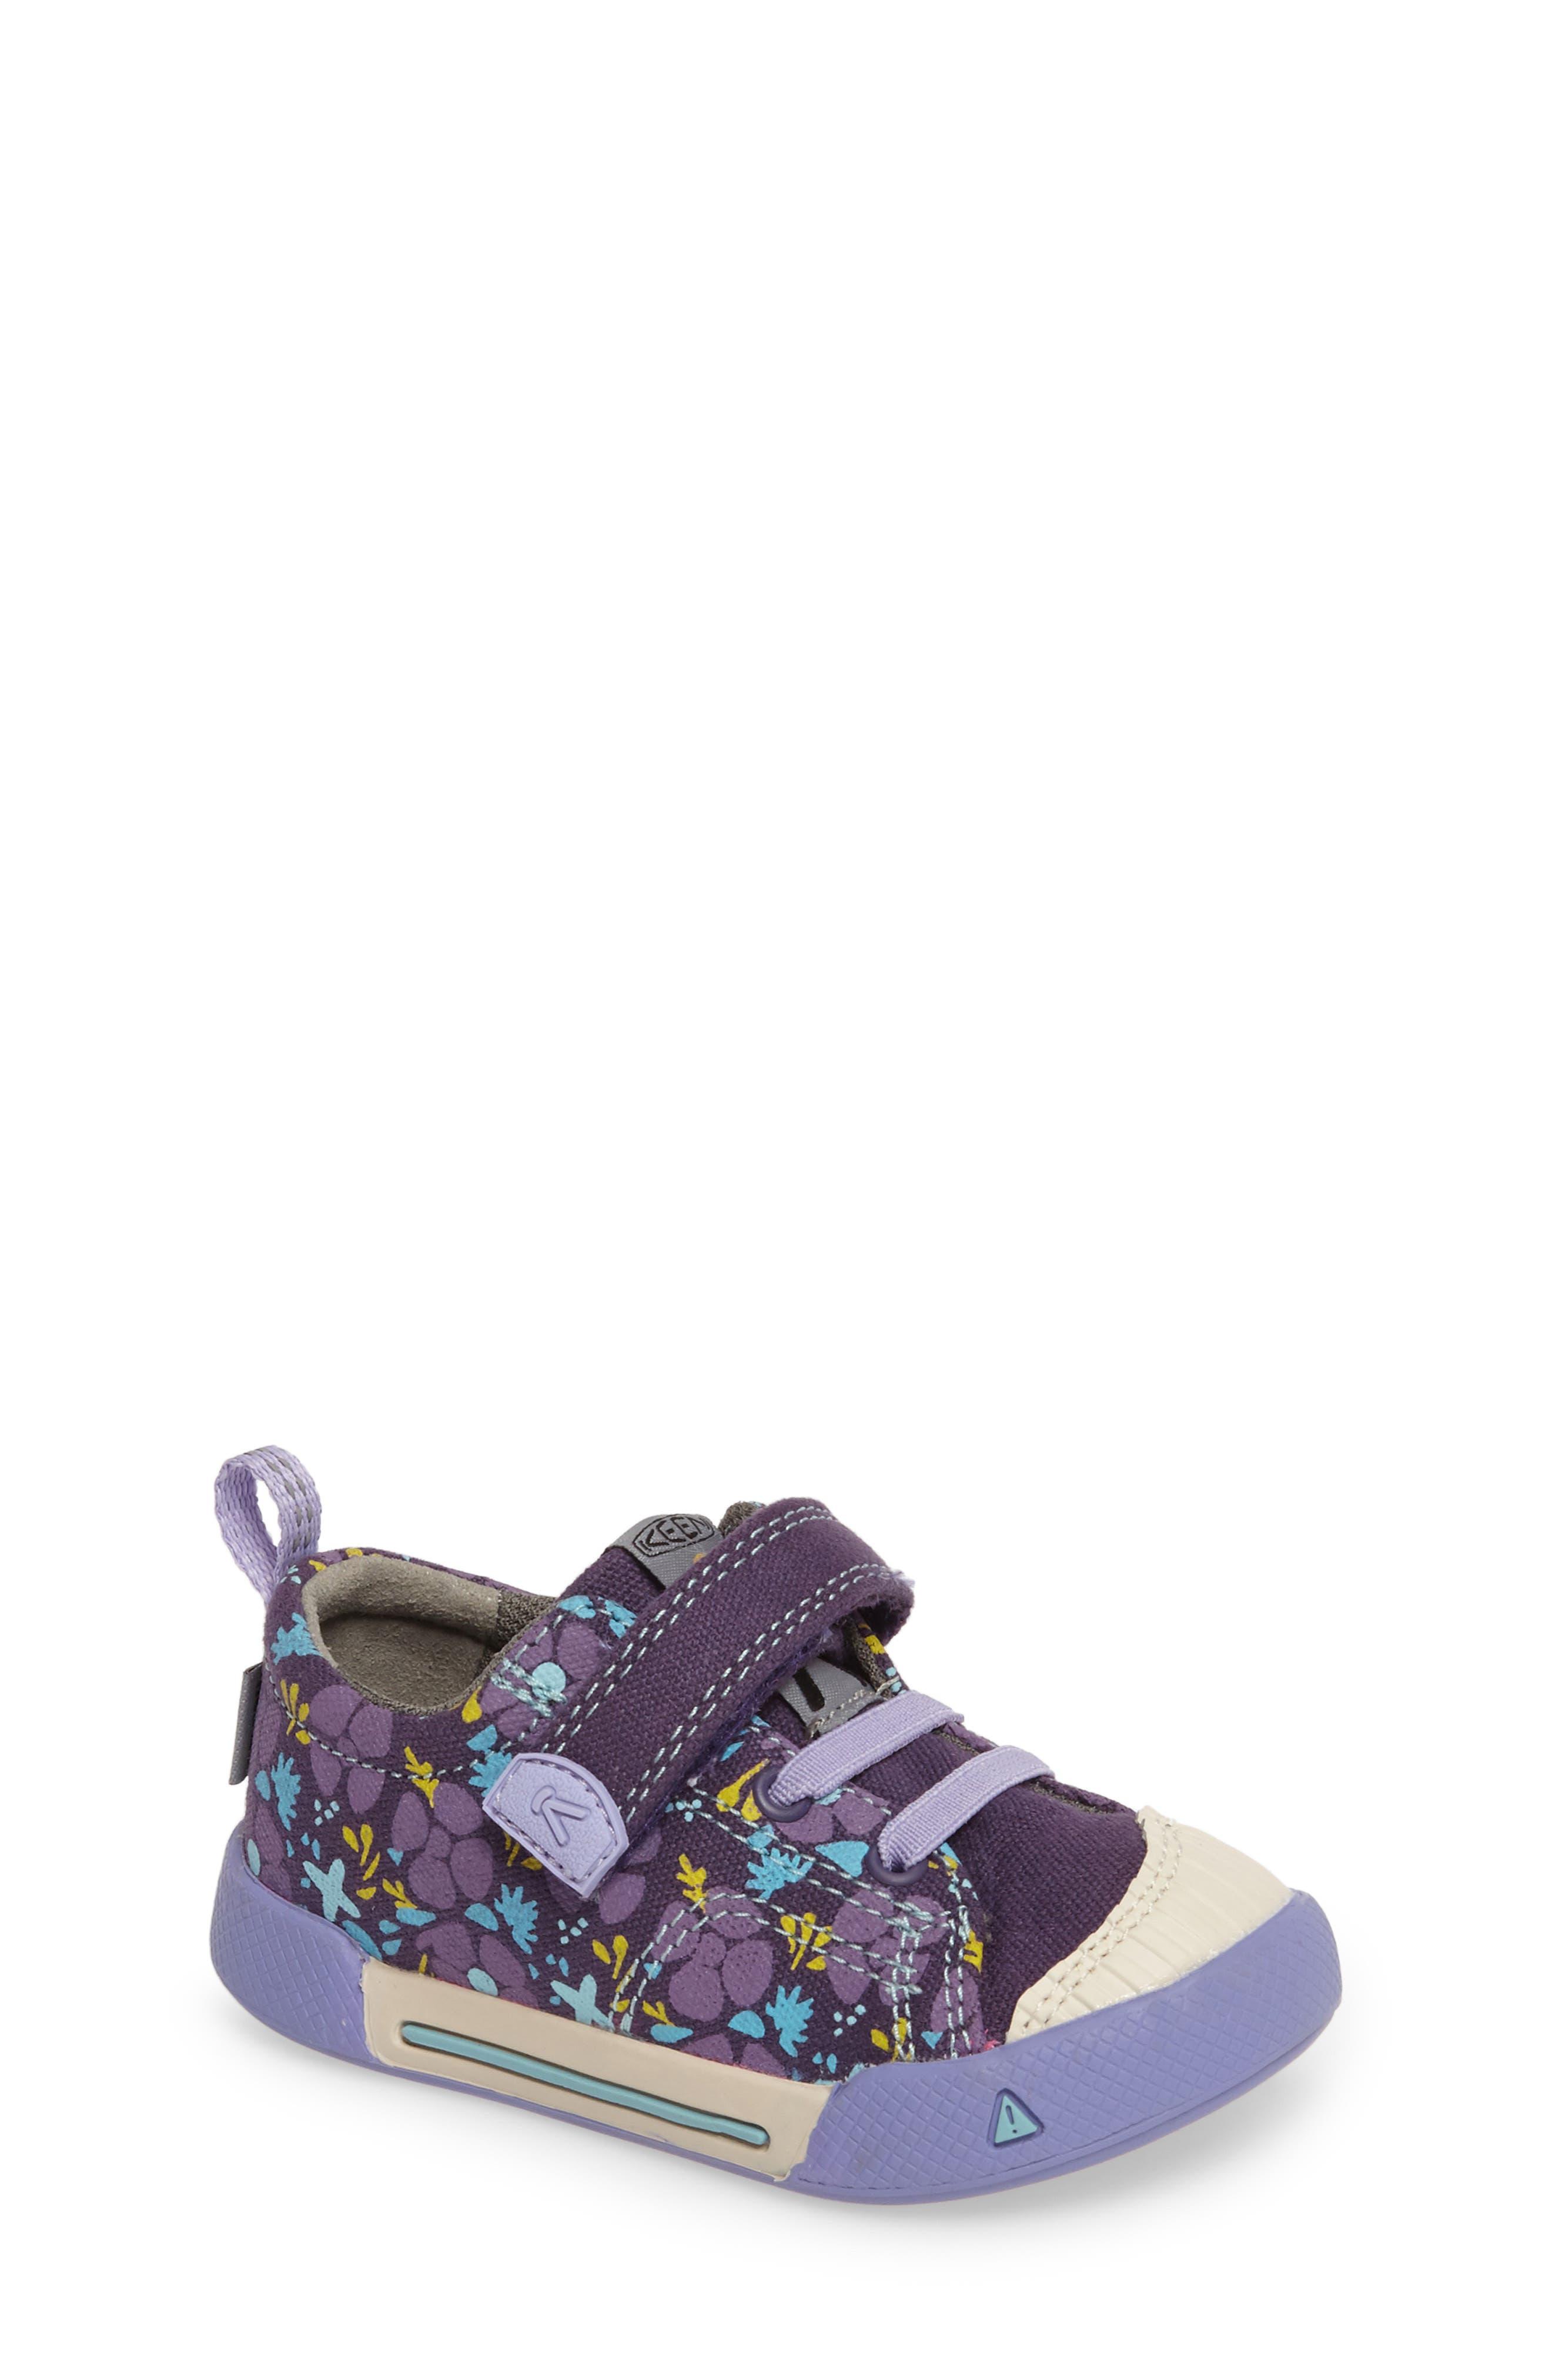 Main Image - Keen Encanto Finley Sneaker (Baby, Walker, Toddler, Little Kid & Big Kid)